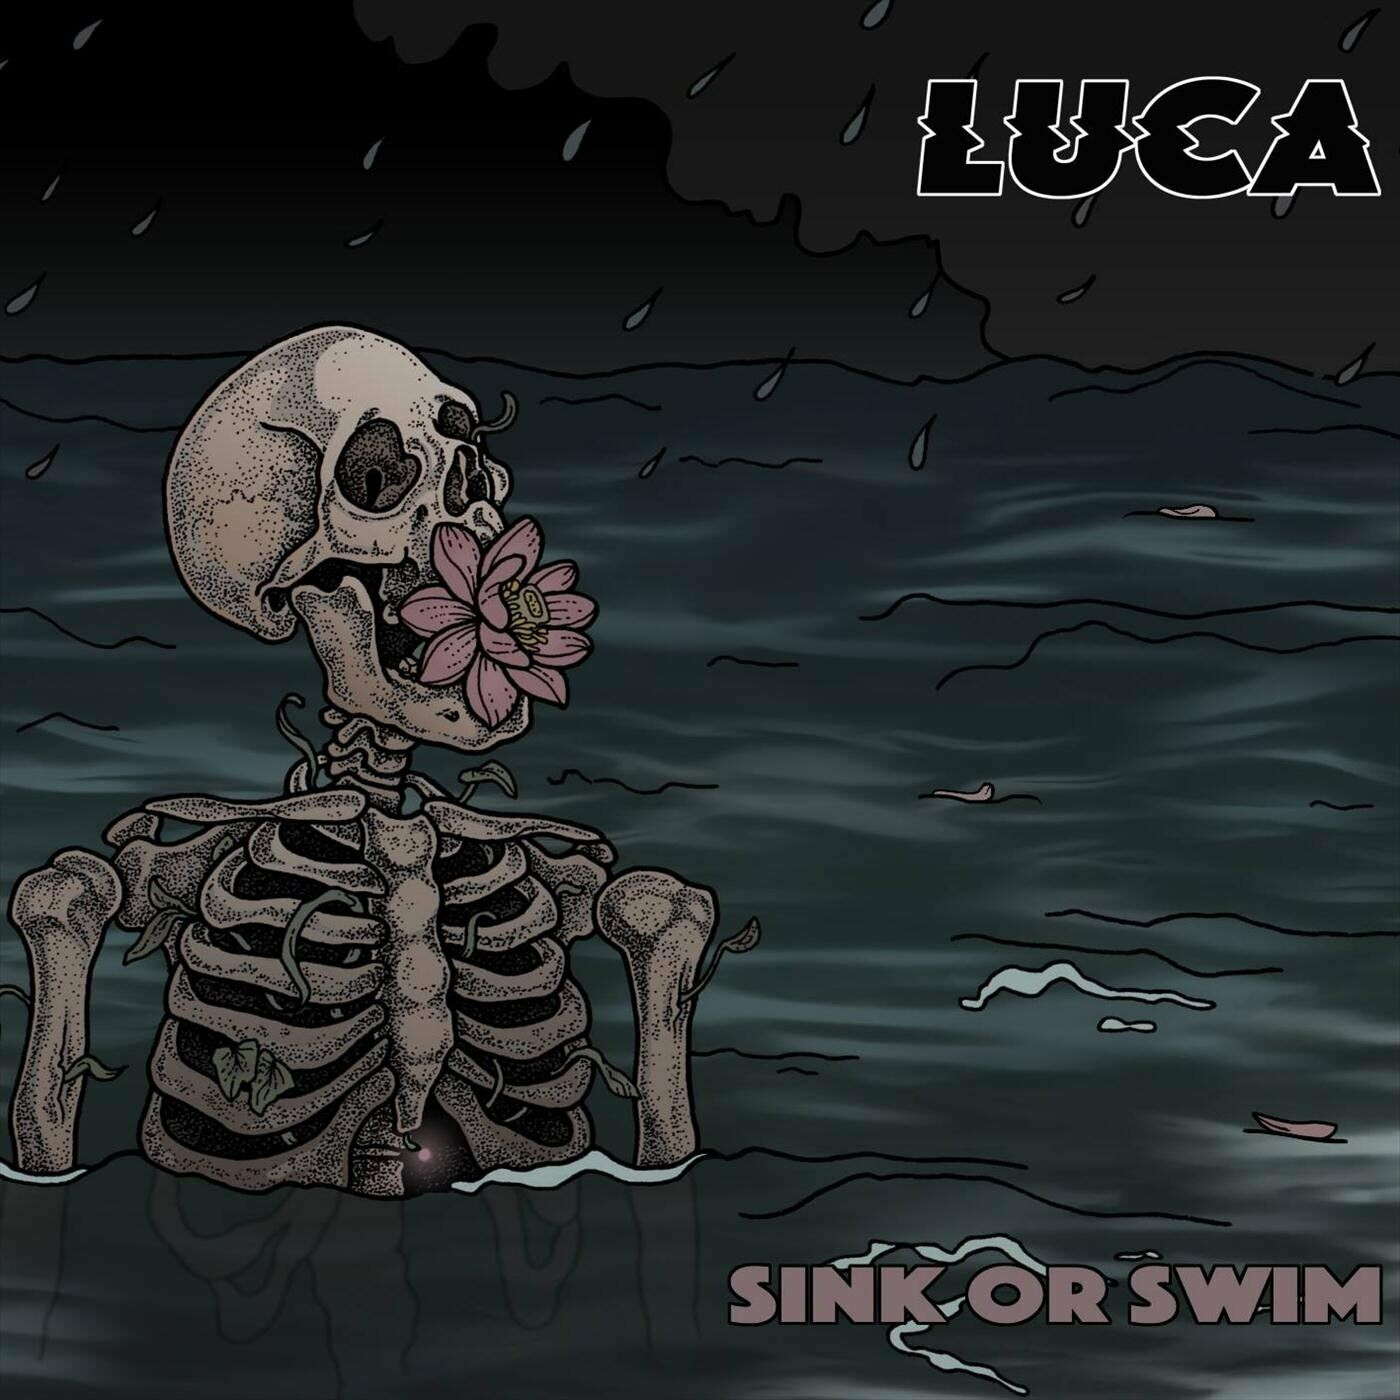 Luca - Sink or Swim [EP] (2019)